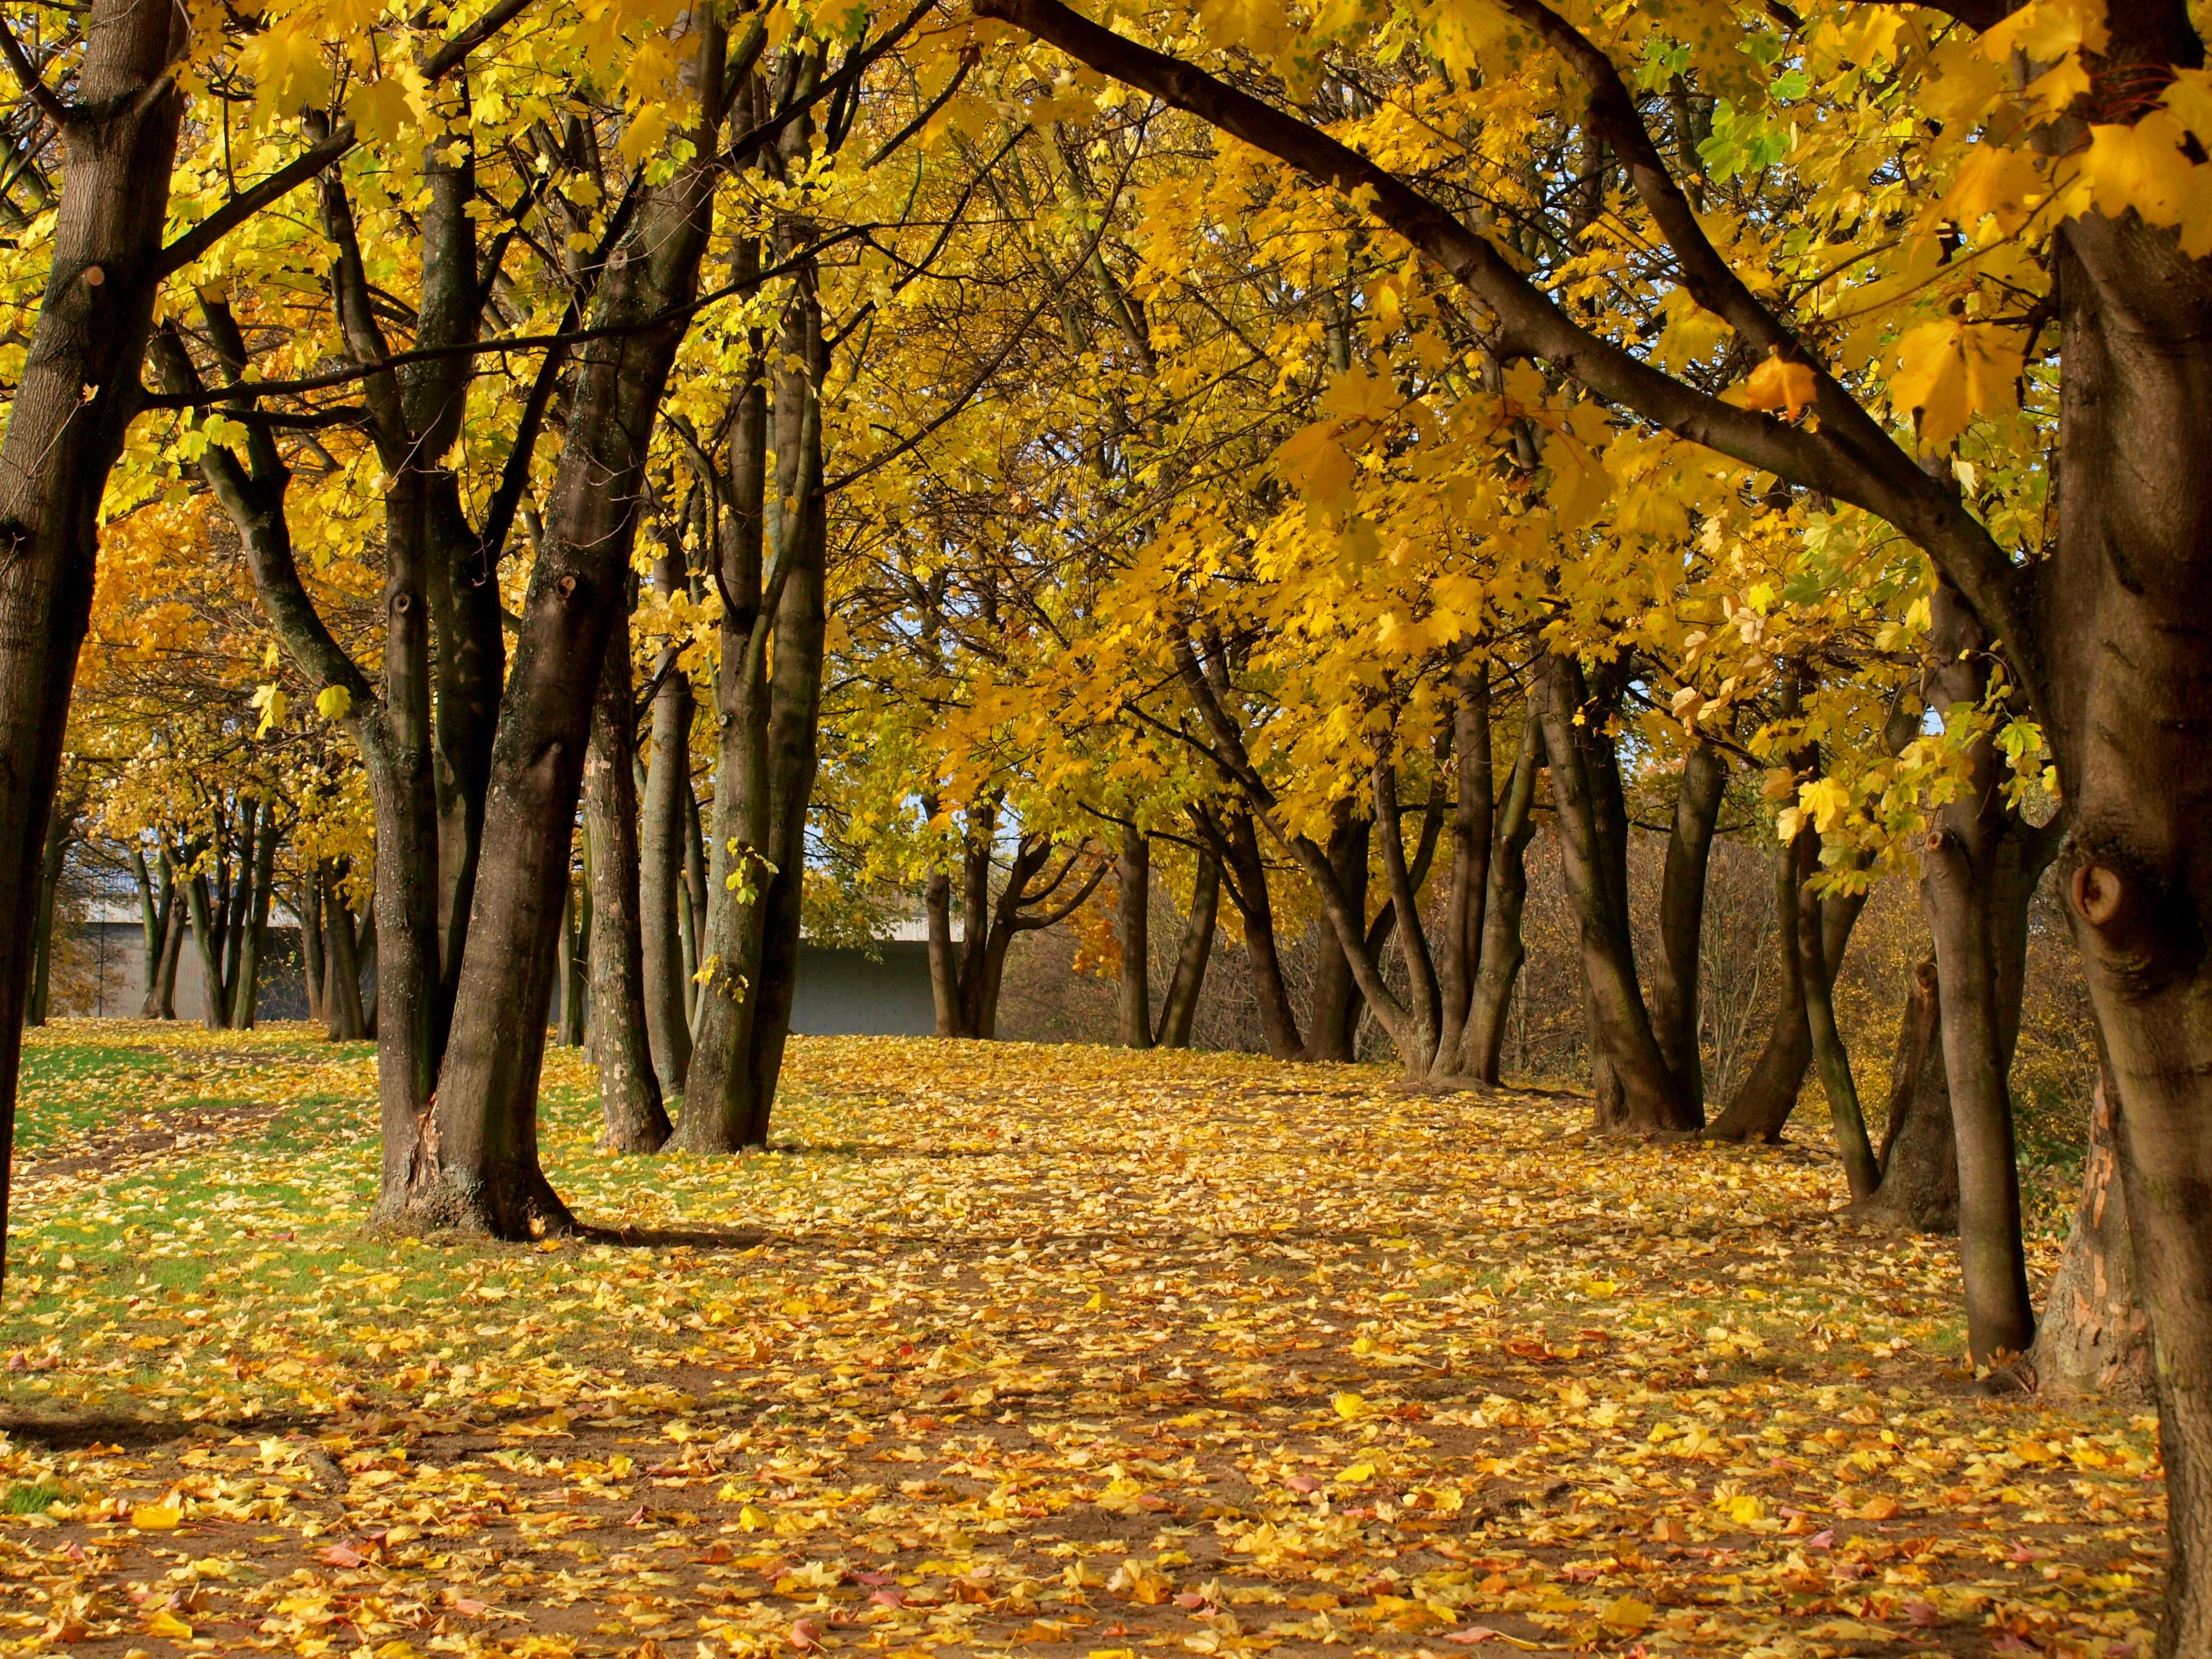 Bing Fall Desktop Wallpaper Rheinaue In Autumn Daniel In Germany